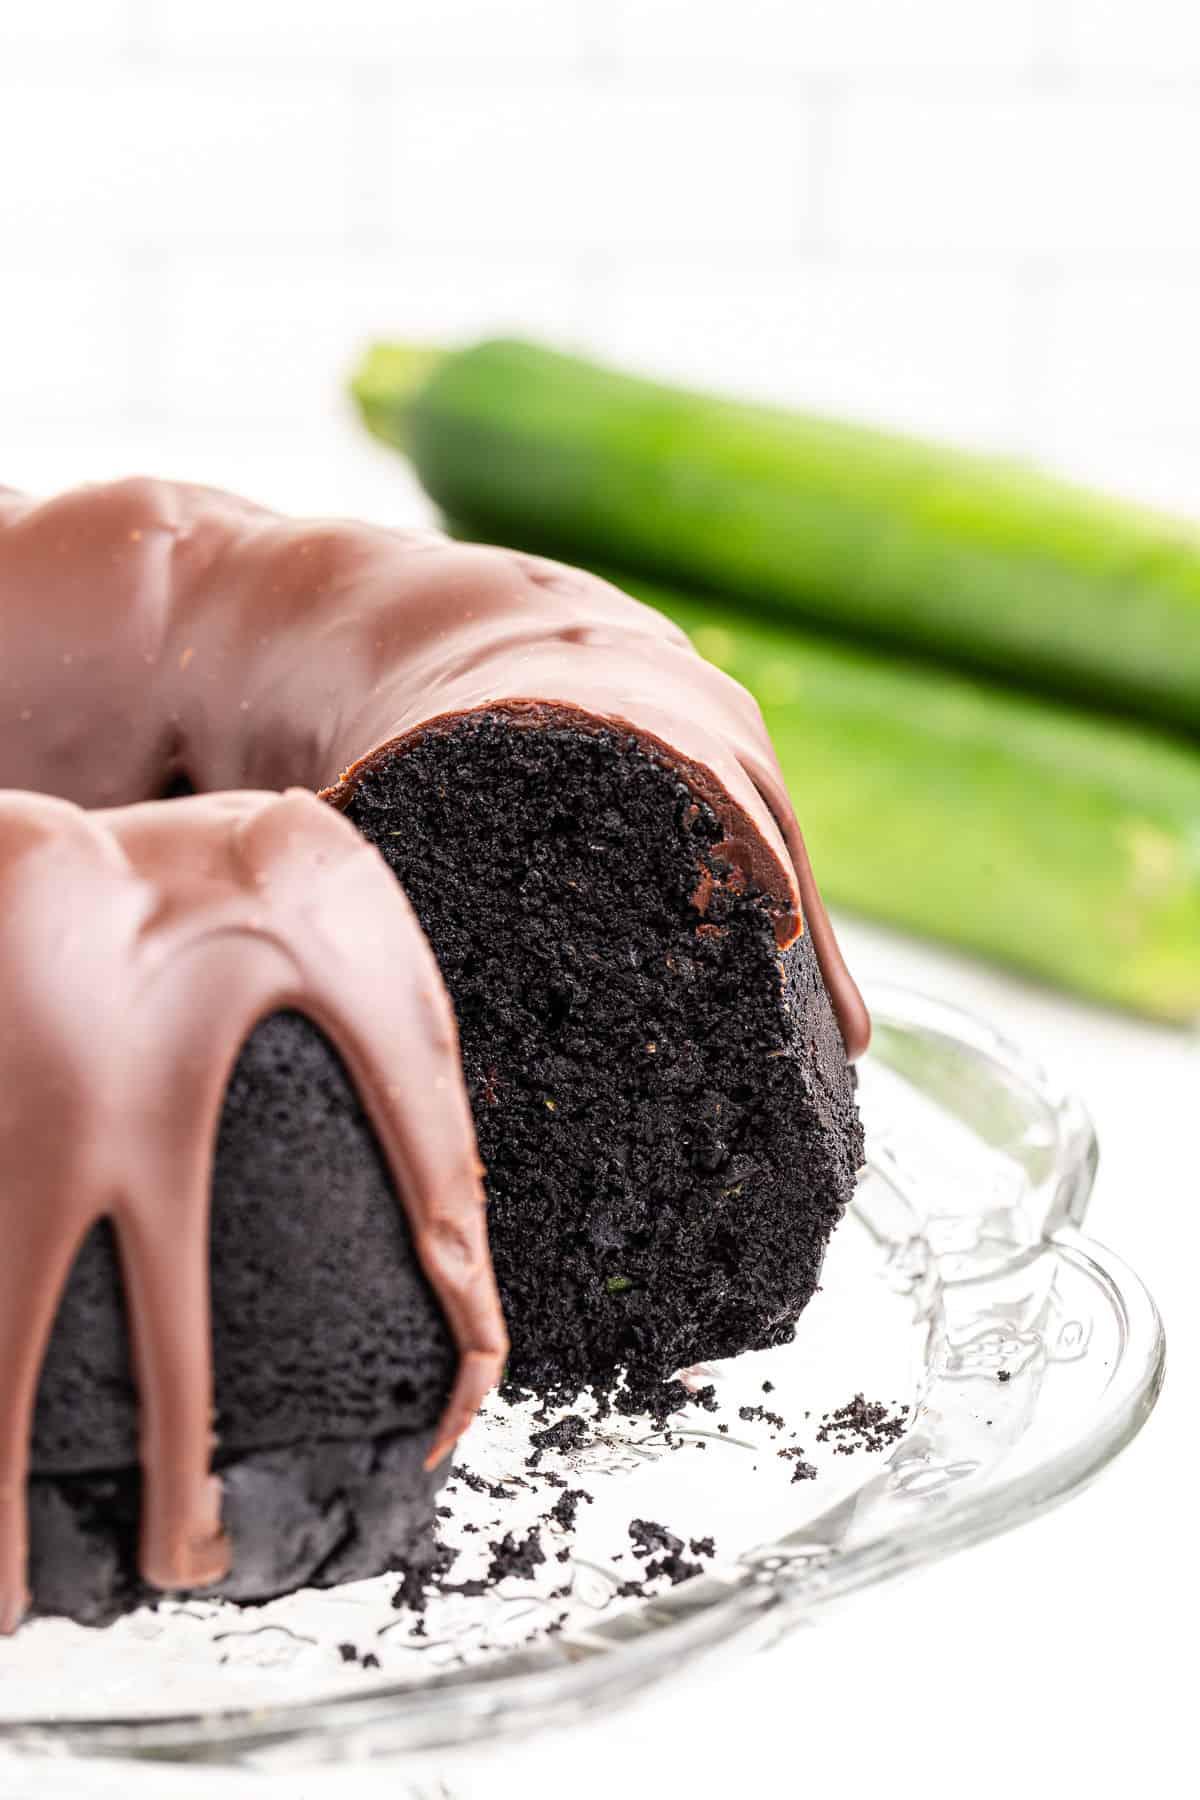 Chocolate bundt cake with zuchini and chocolate ganache.